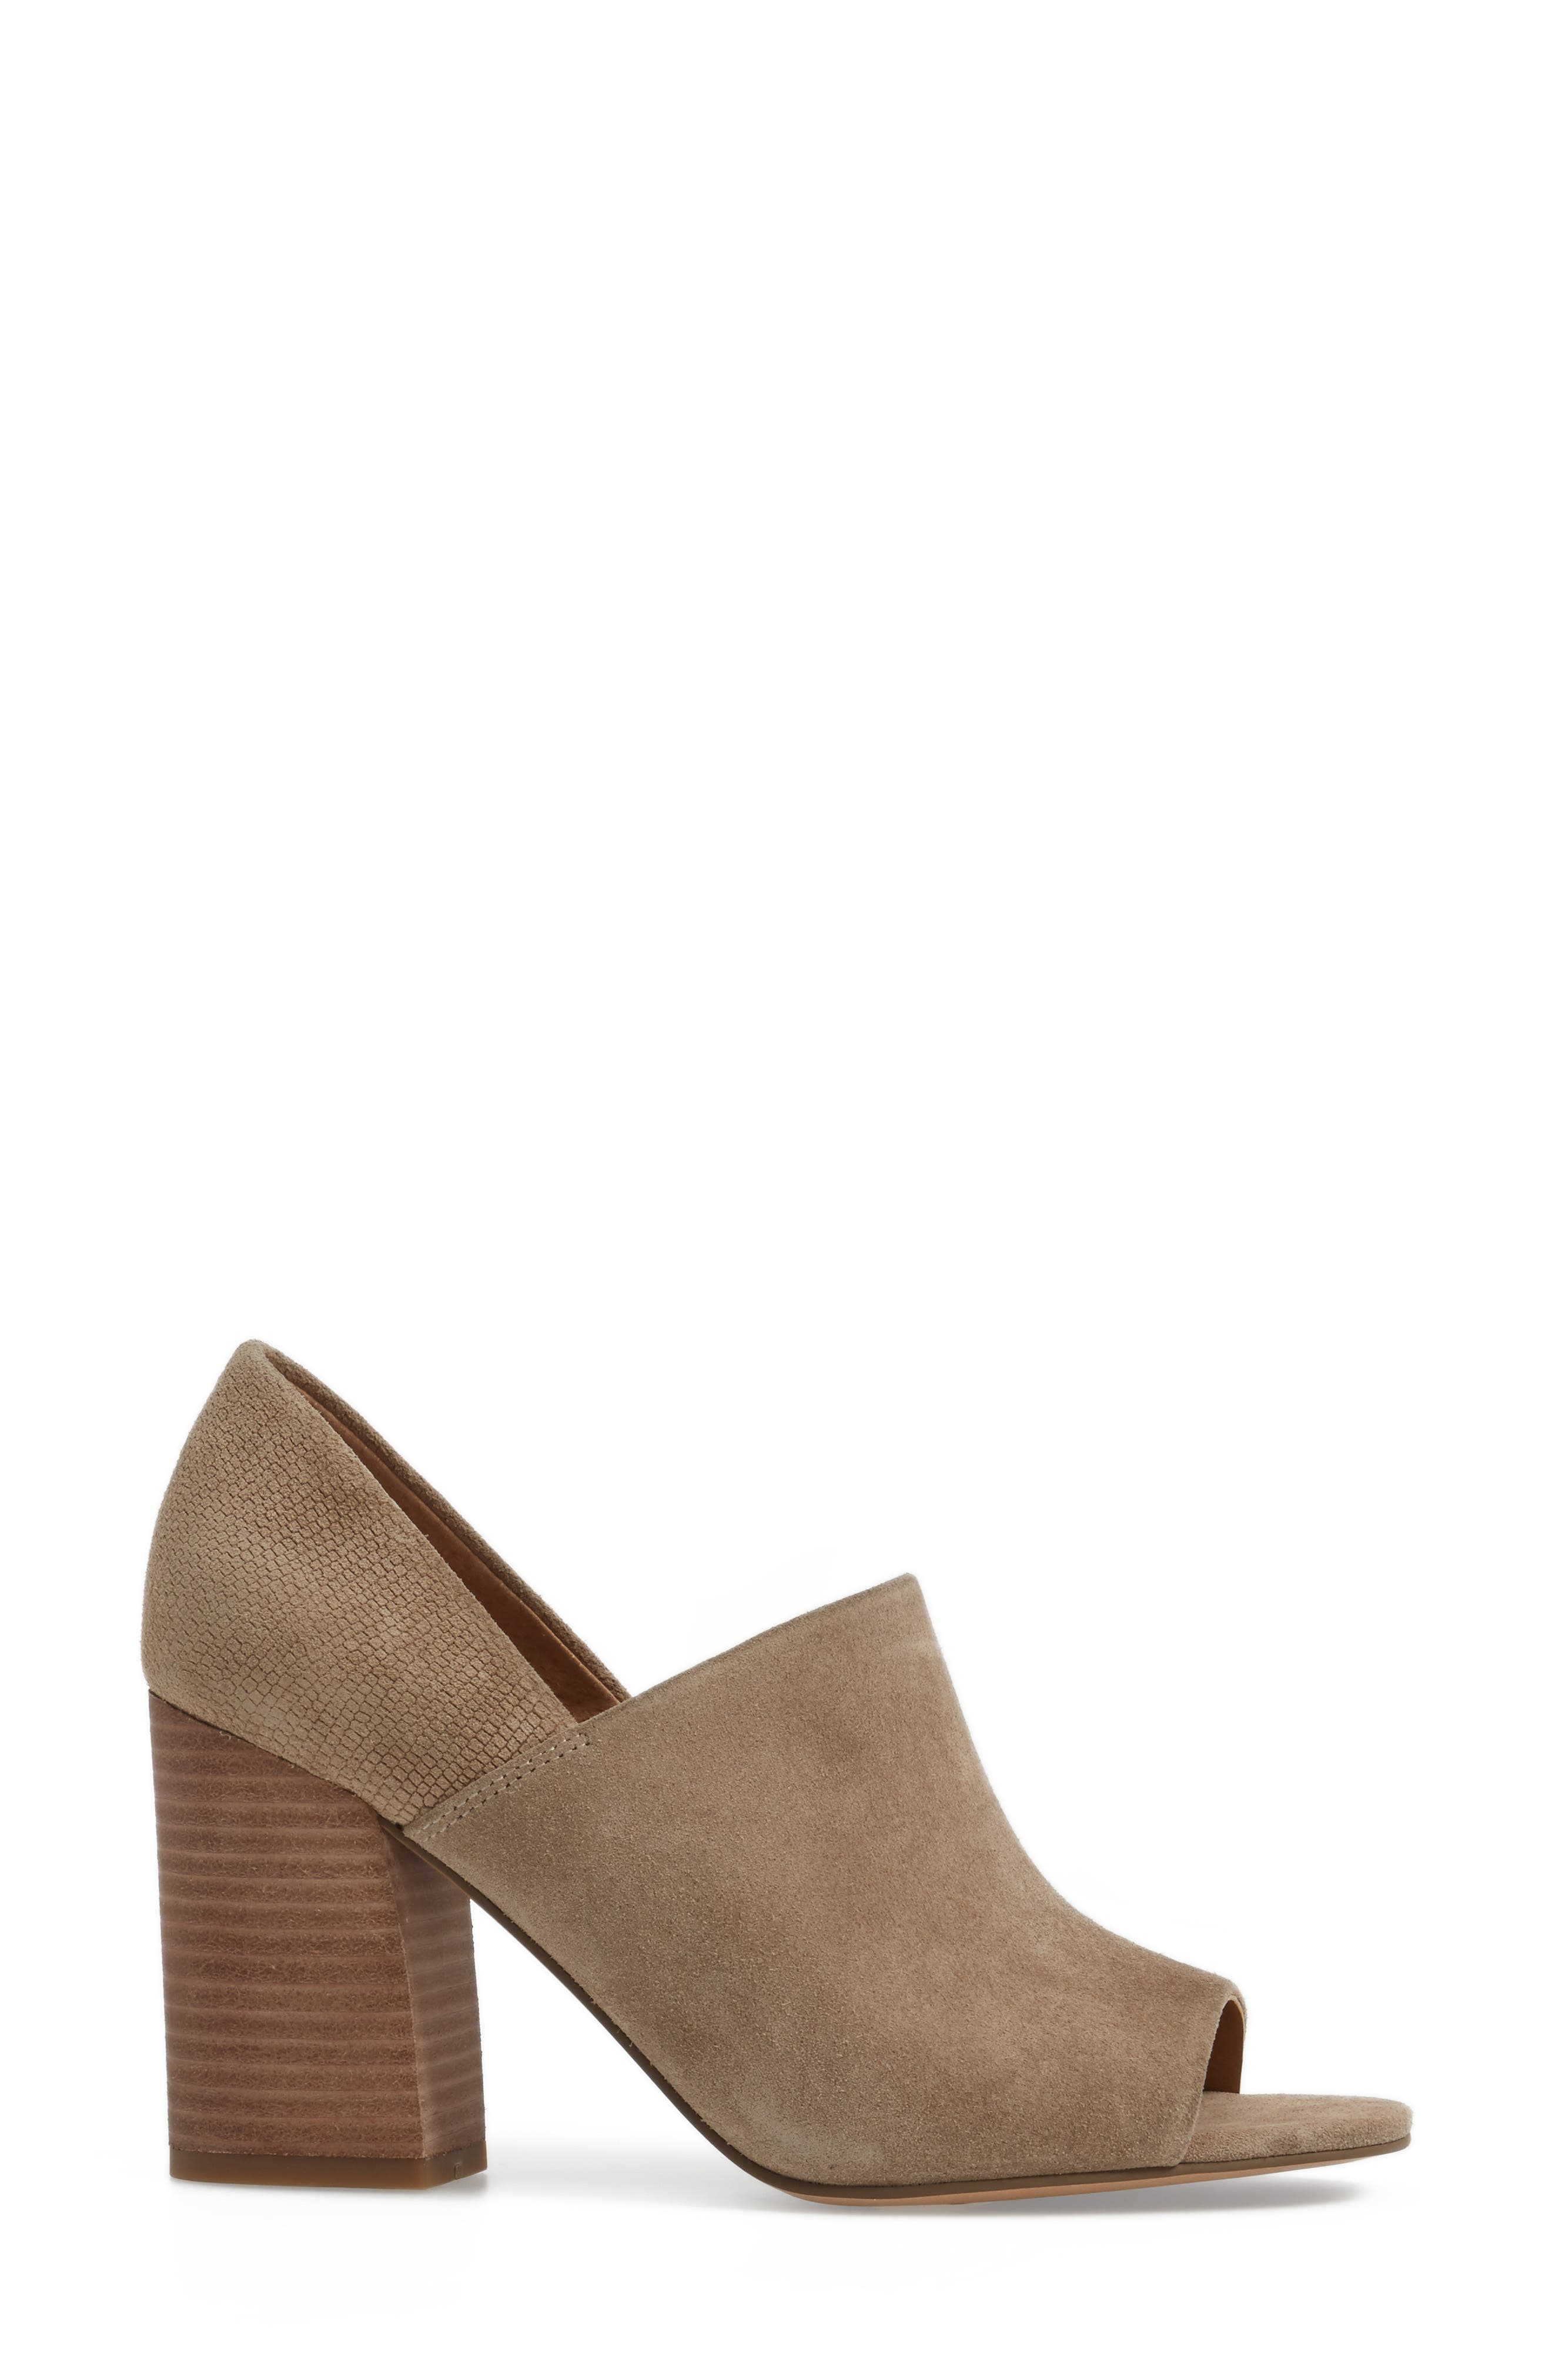 Ellison Block Heel Sandal,                             Alternate thumbnail 9, color,